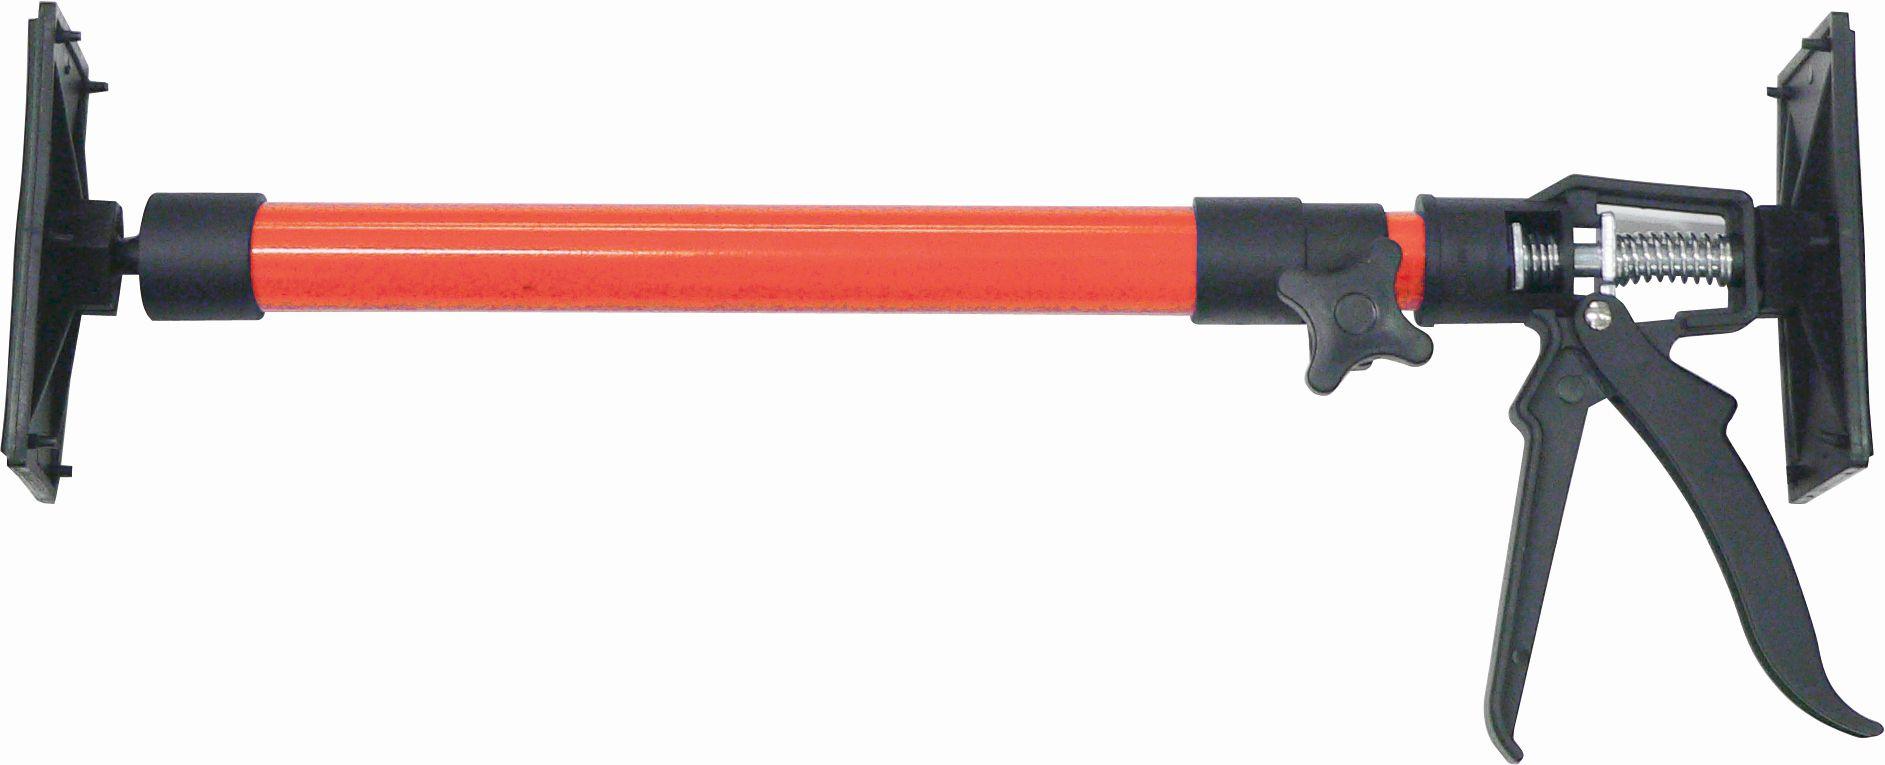 türspanner türspreize set 6 stück türfutterstrebe 50-115 cm